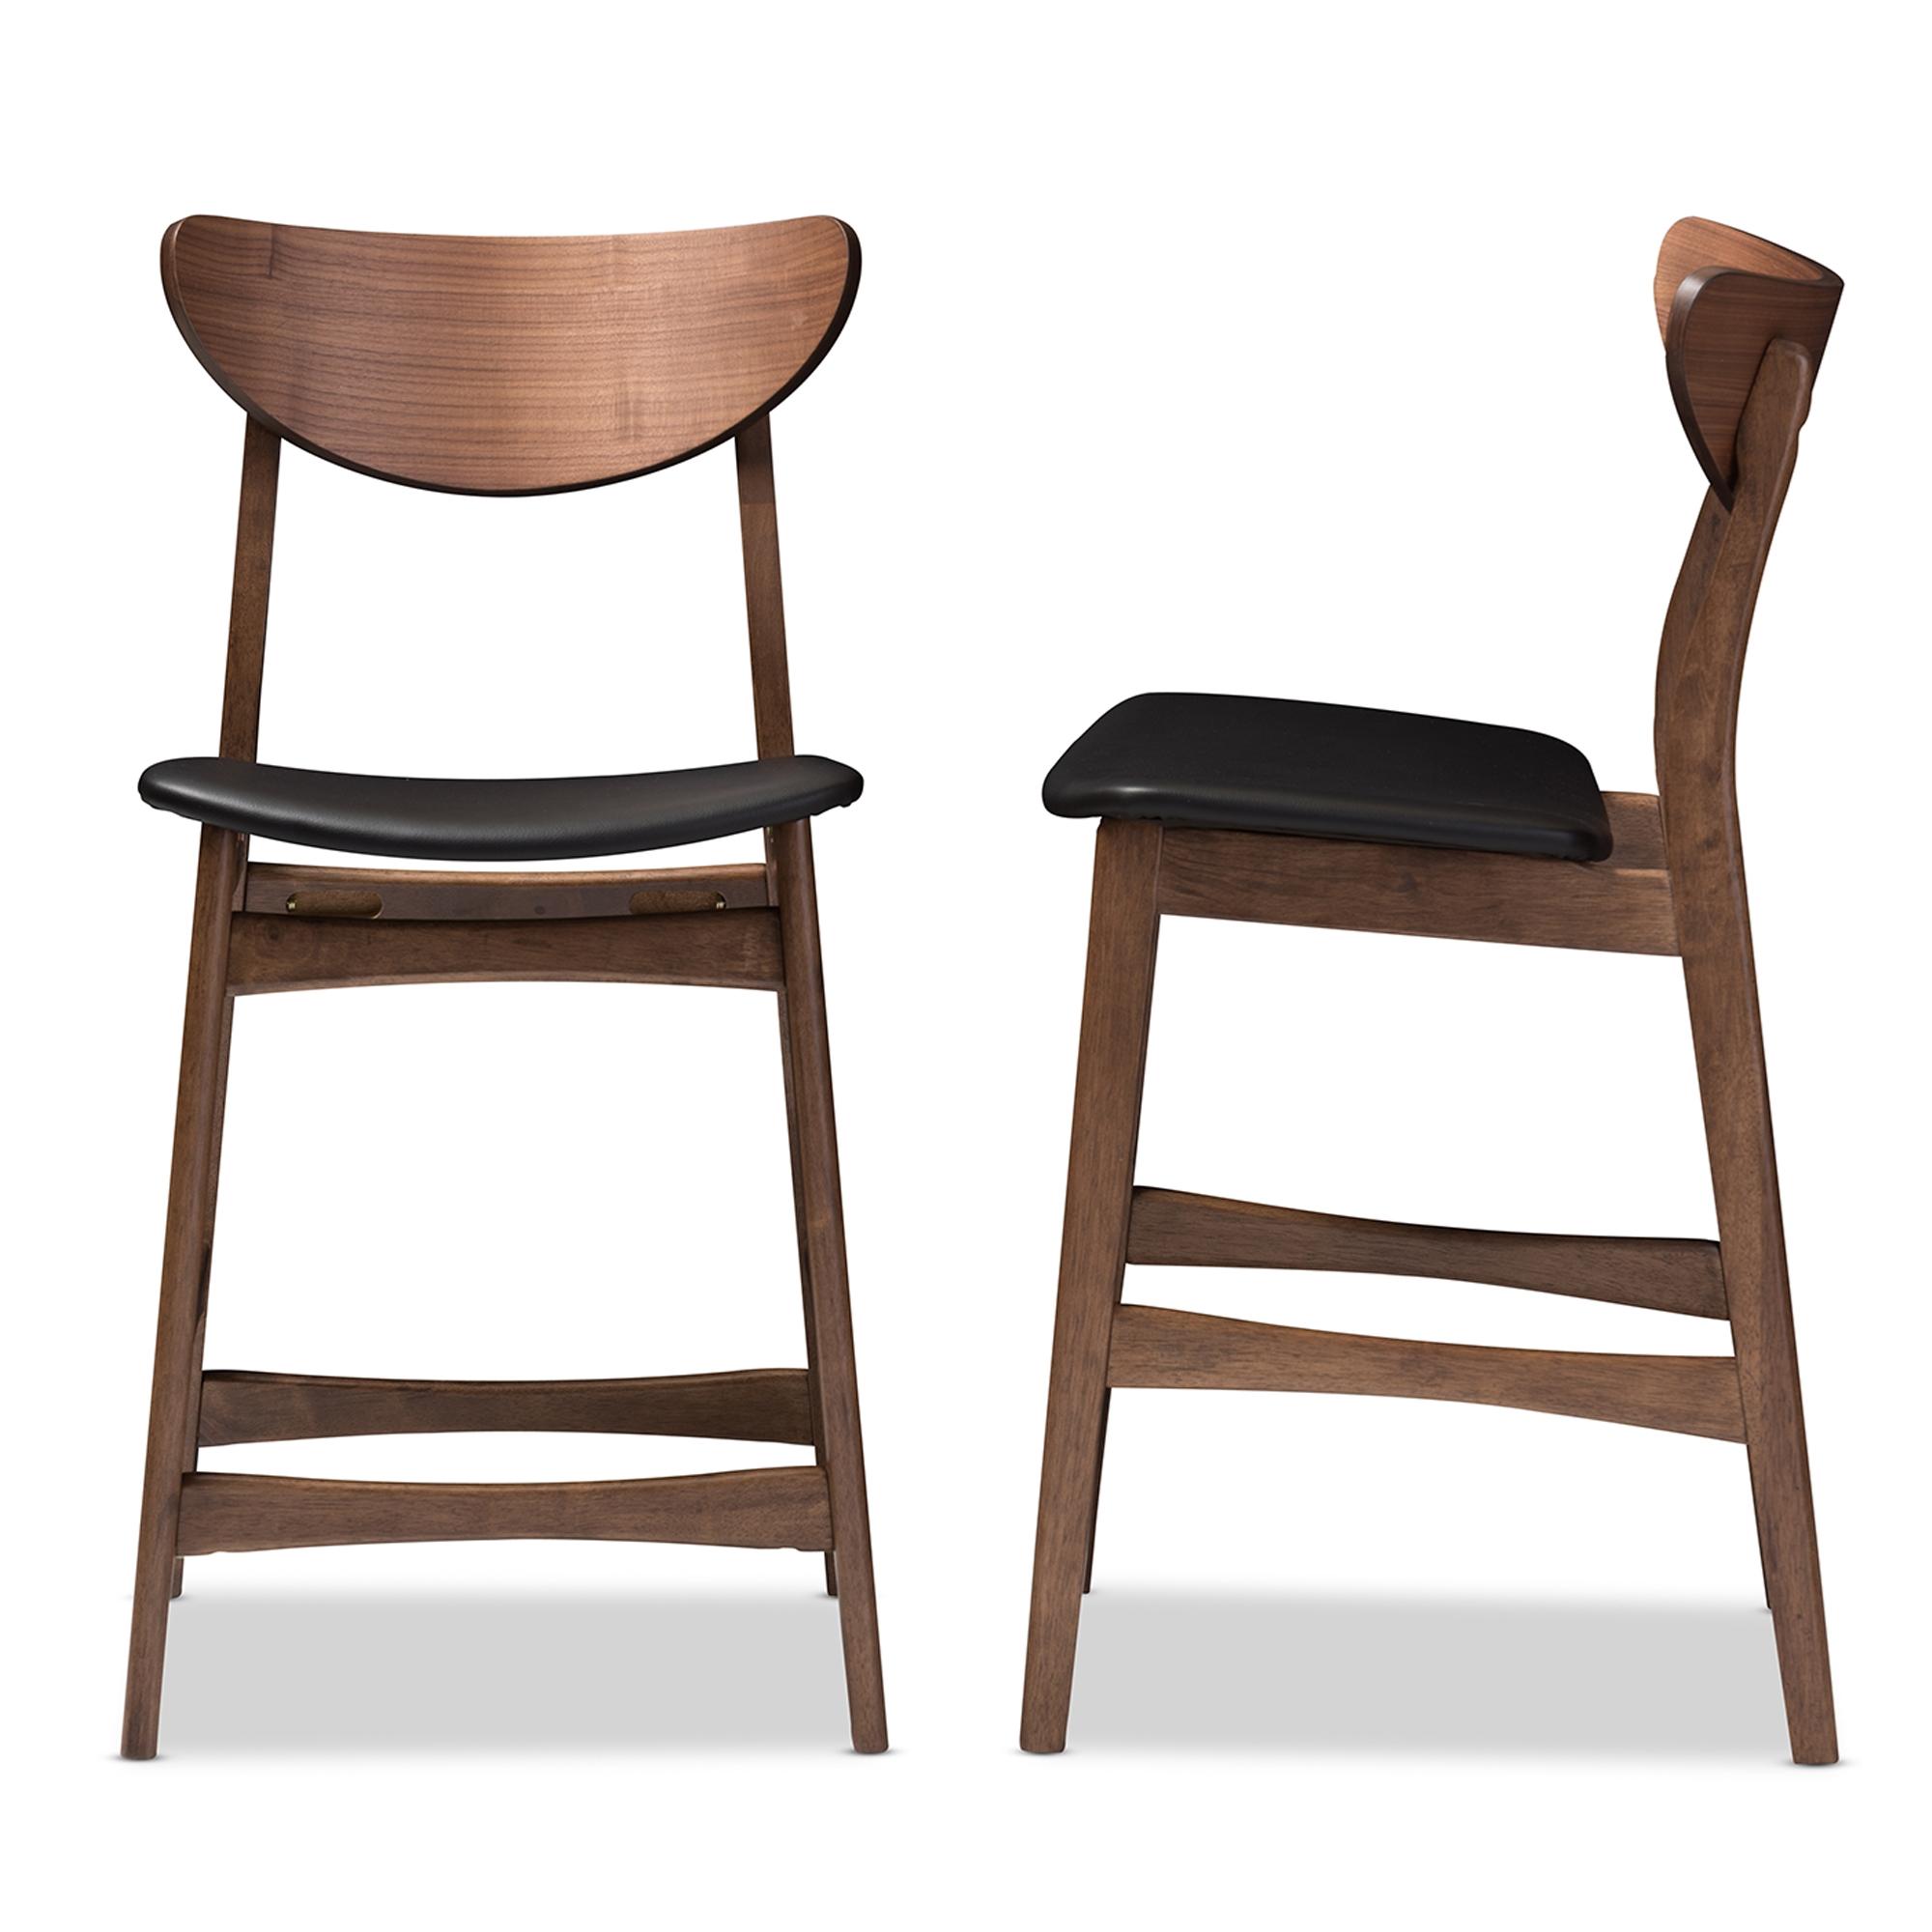 Baxton studio latina mid century retro modern scandinavian style black faux leather upholstered walnut wood